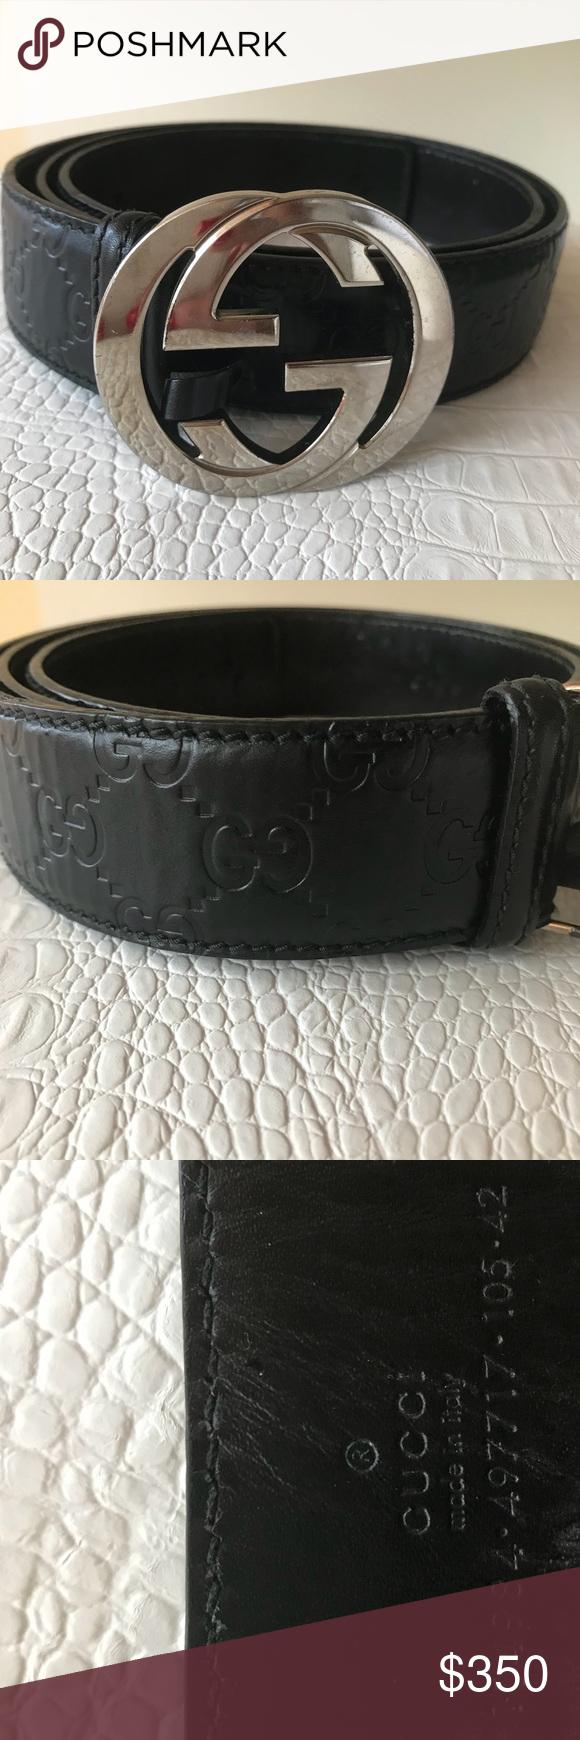 fbb160d0060 Black Leather Gucci Belt For Men Good Condition Signature